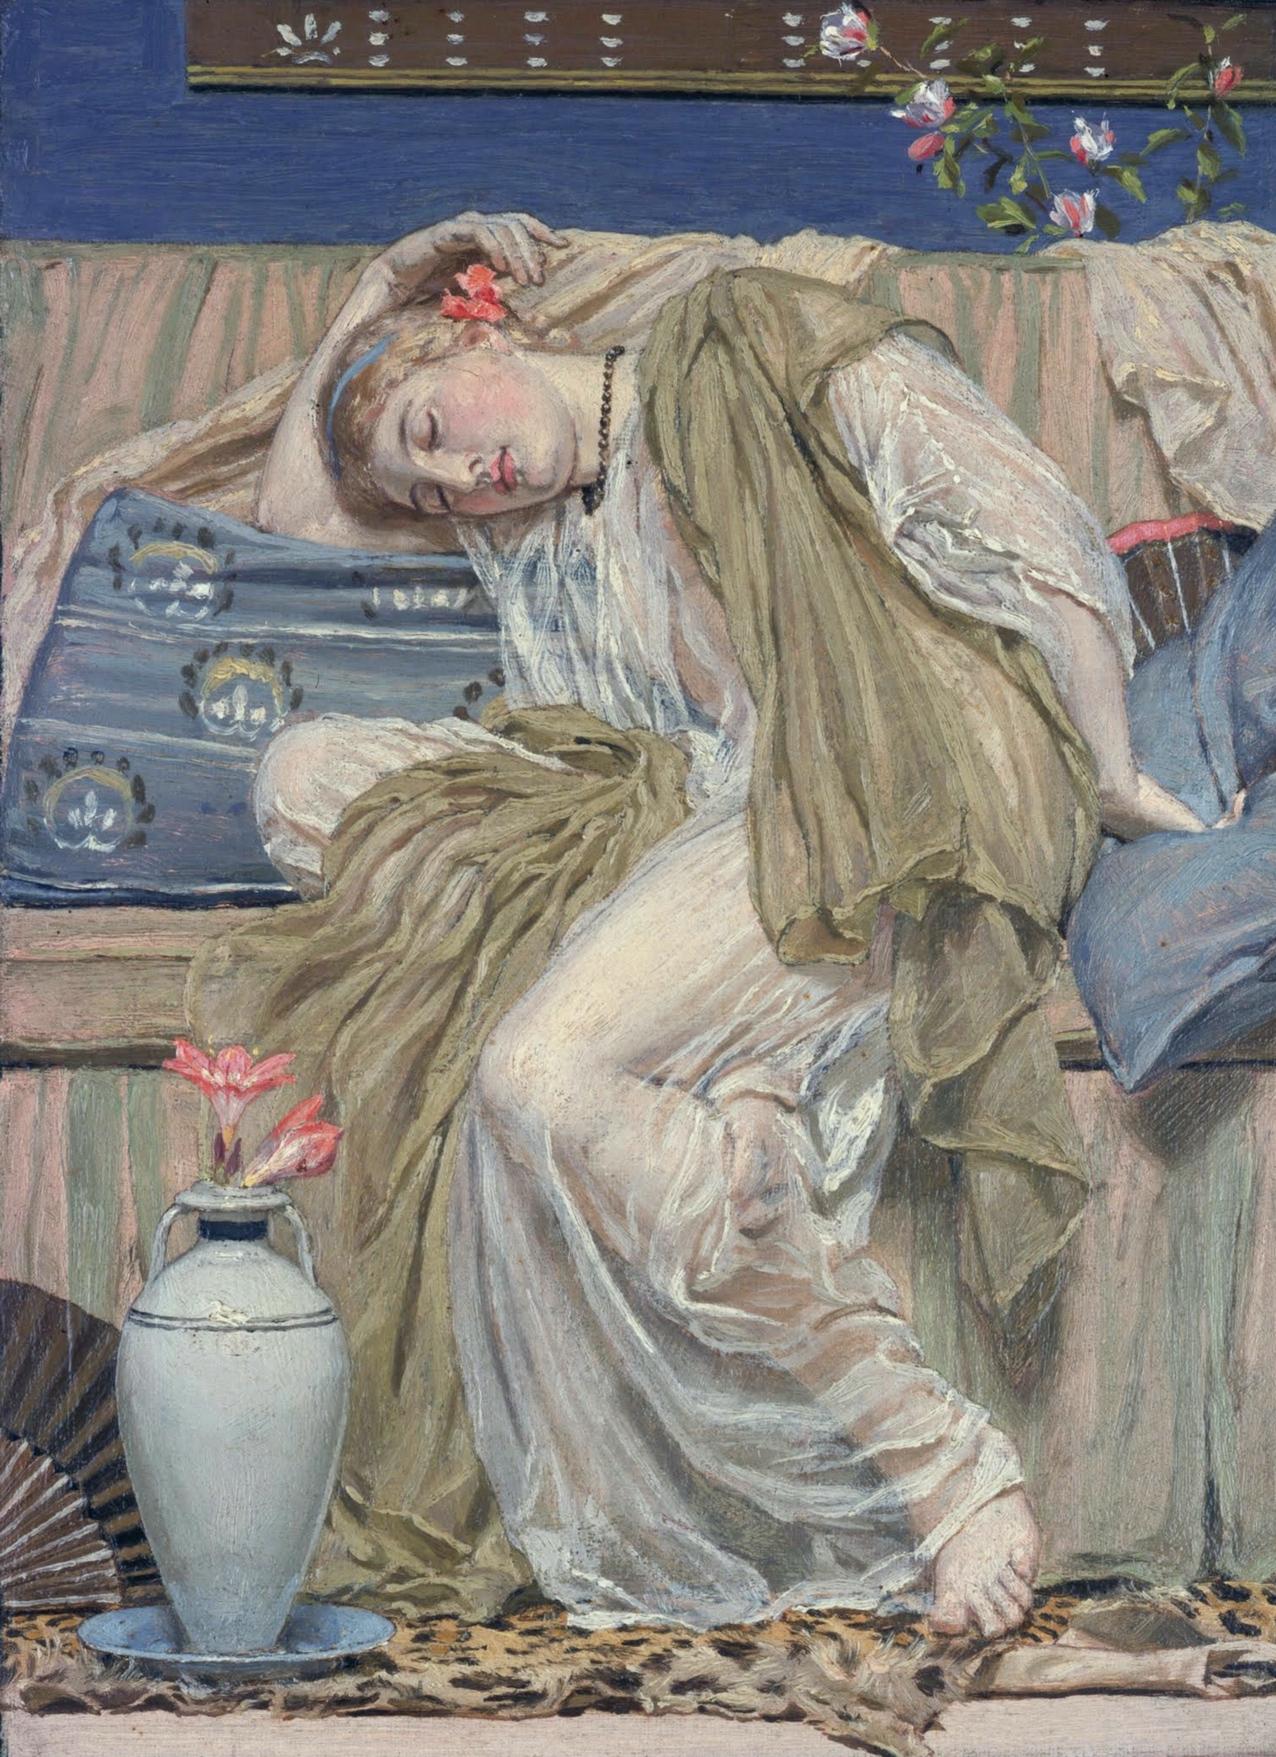 Блоги. Галерея «Tate Britain,London». BritainLondon», dodjik007, ЯндексФоткахltmore, «Tate, альбоме, здравствуйте, Фотографии, привет